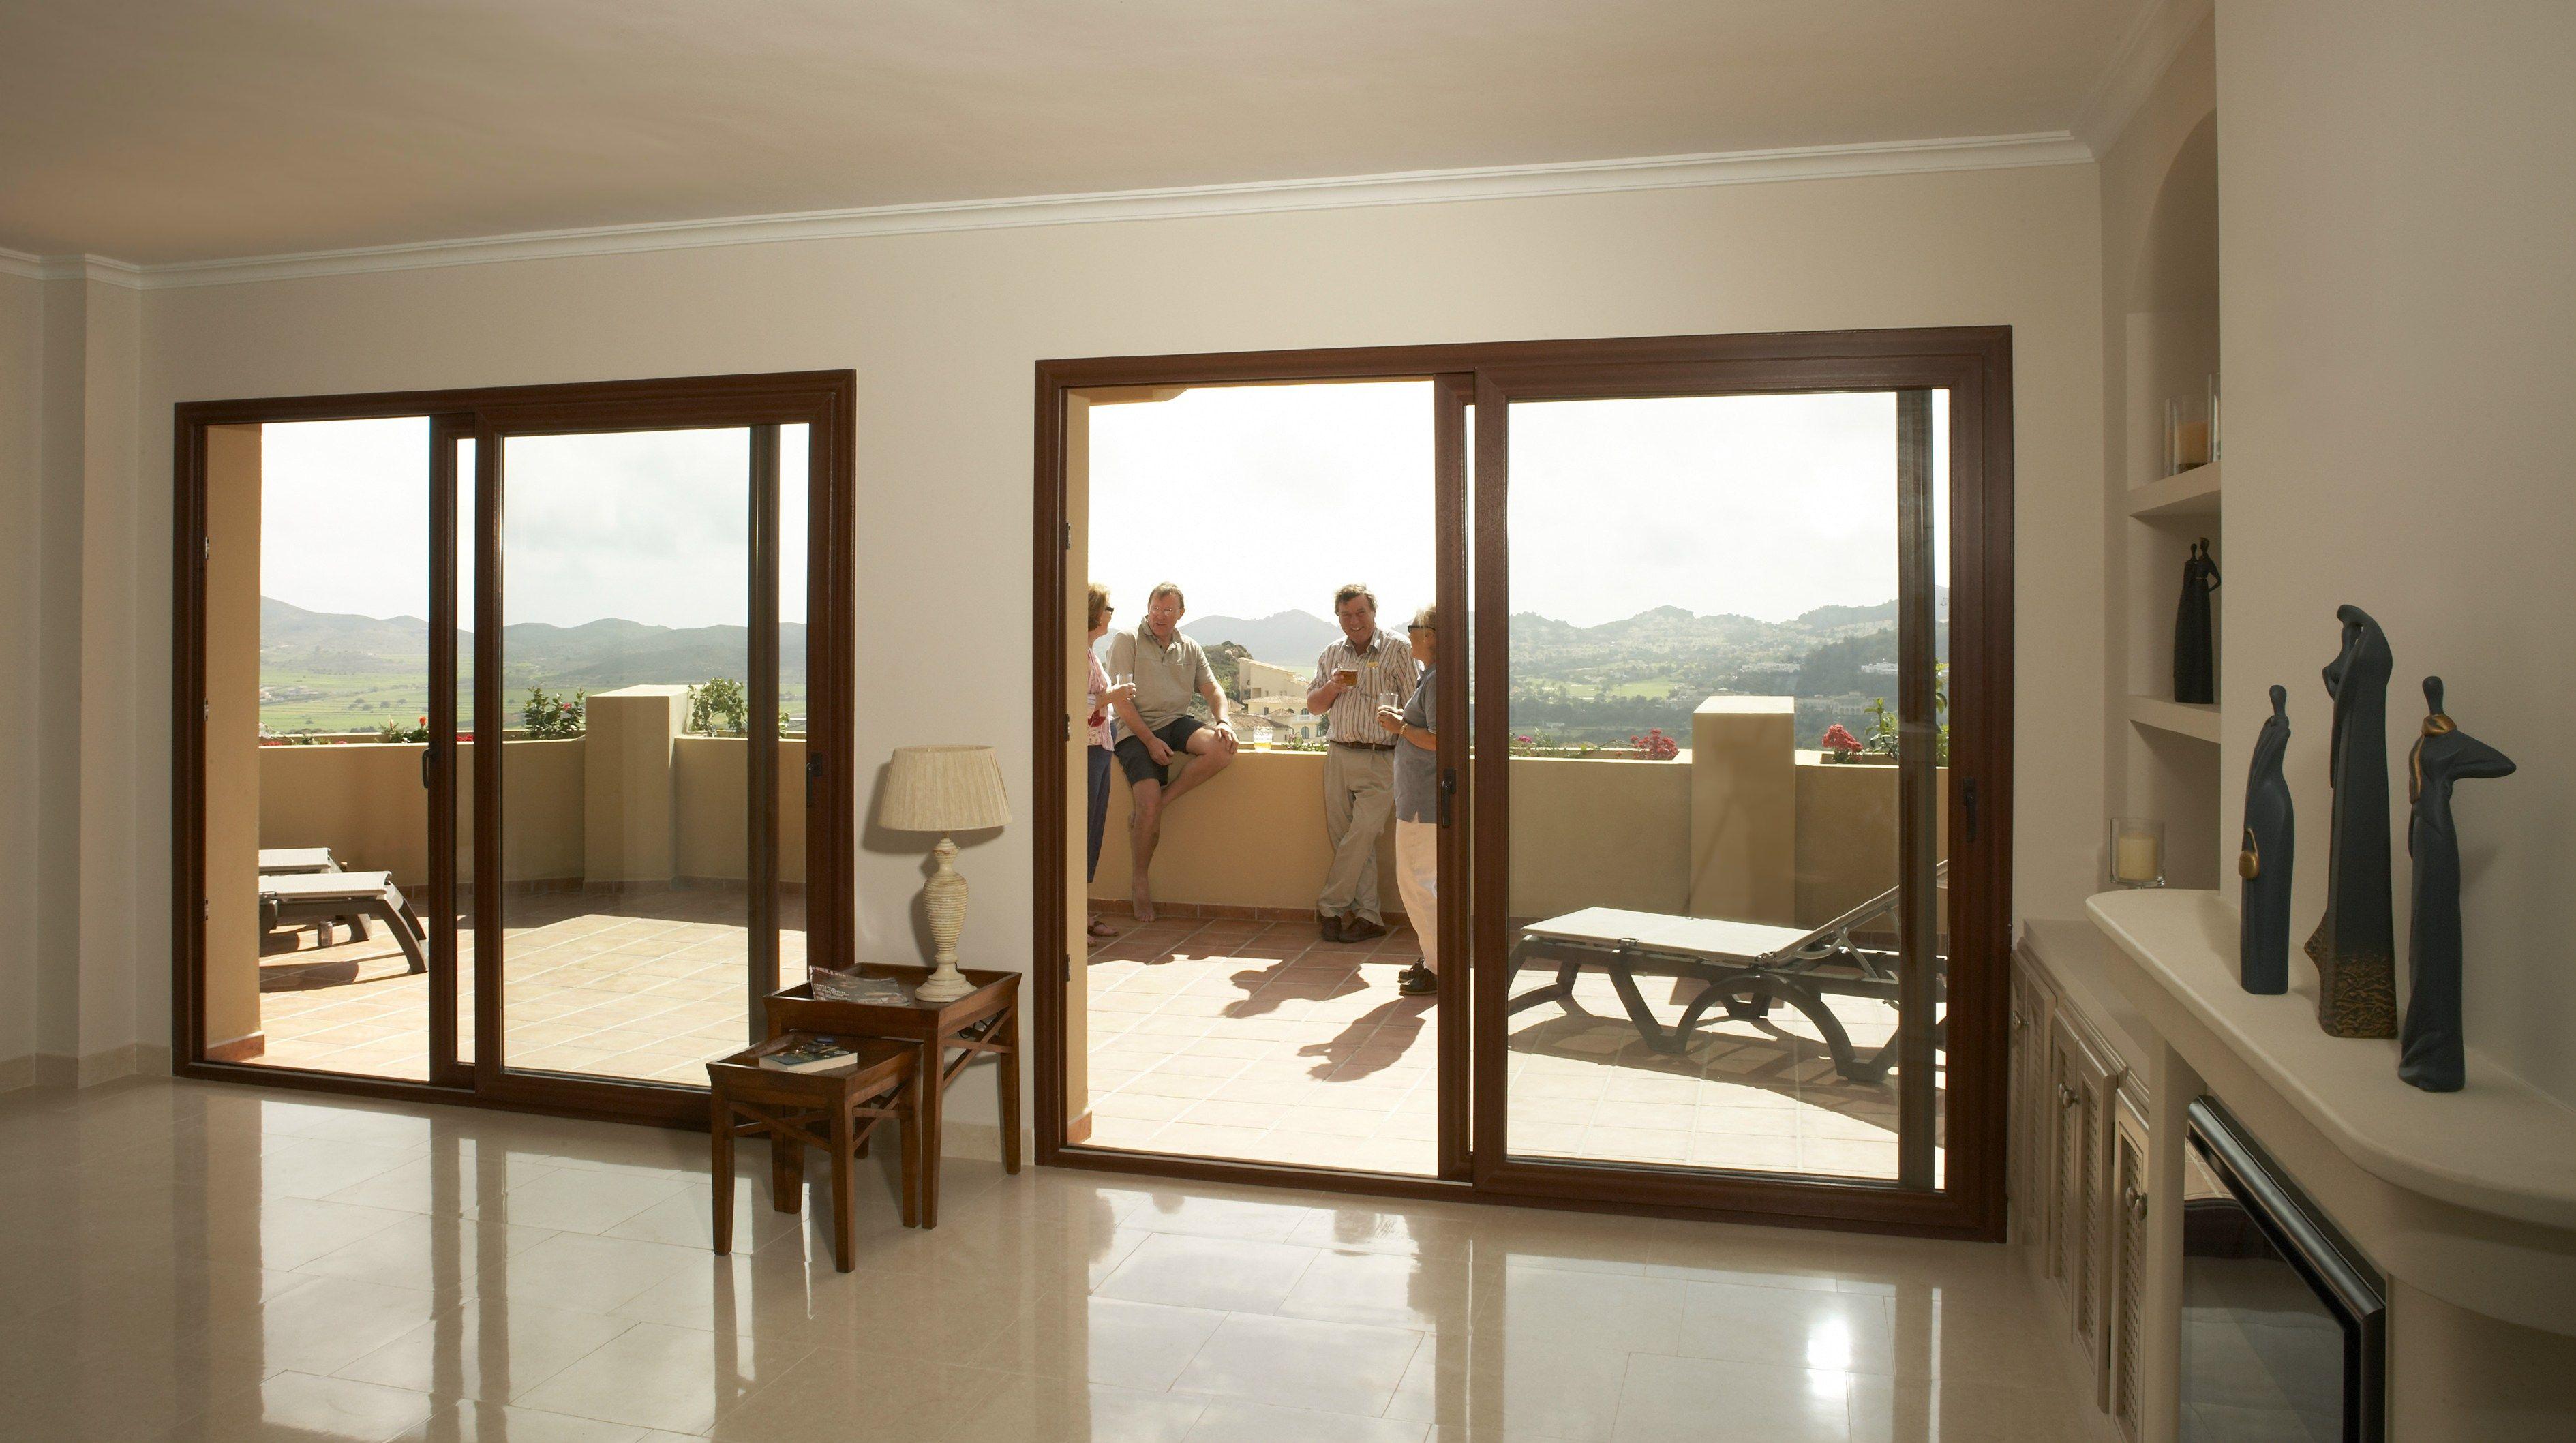 bodentiefe schiebeelemente wohnideen. Black Bedroom Furniture Sets. Home Design Ideas